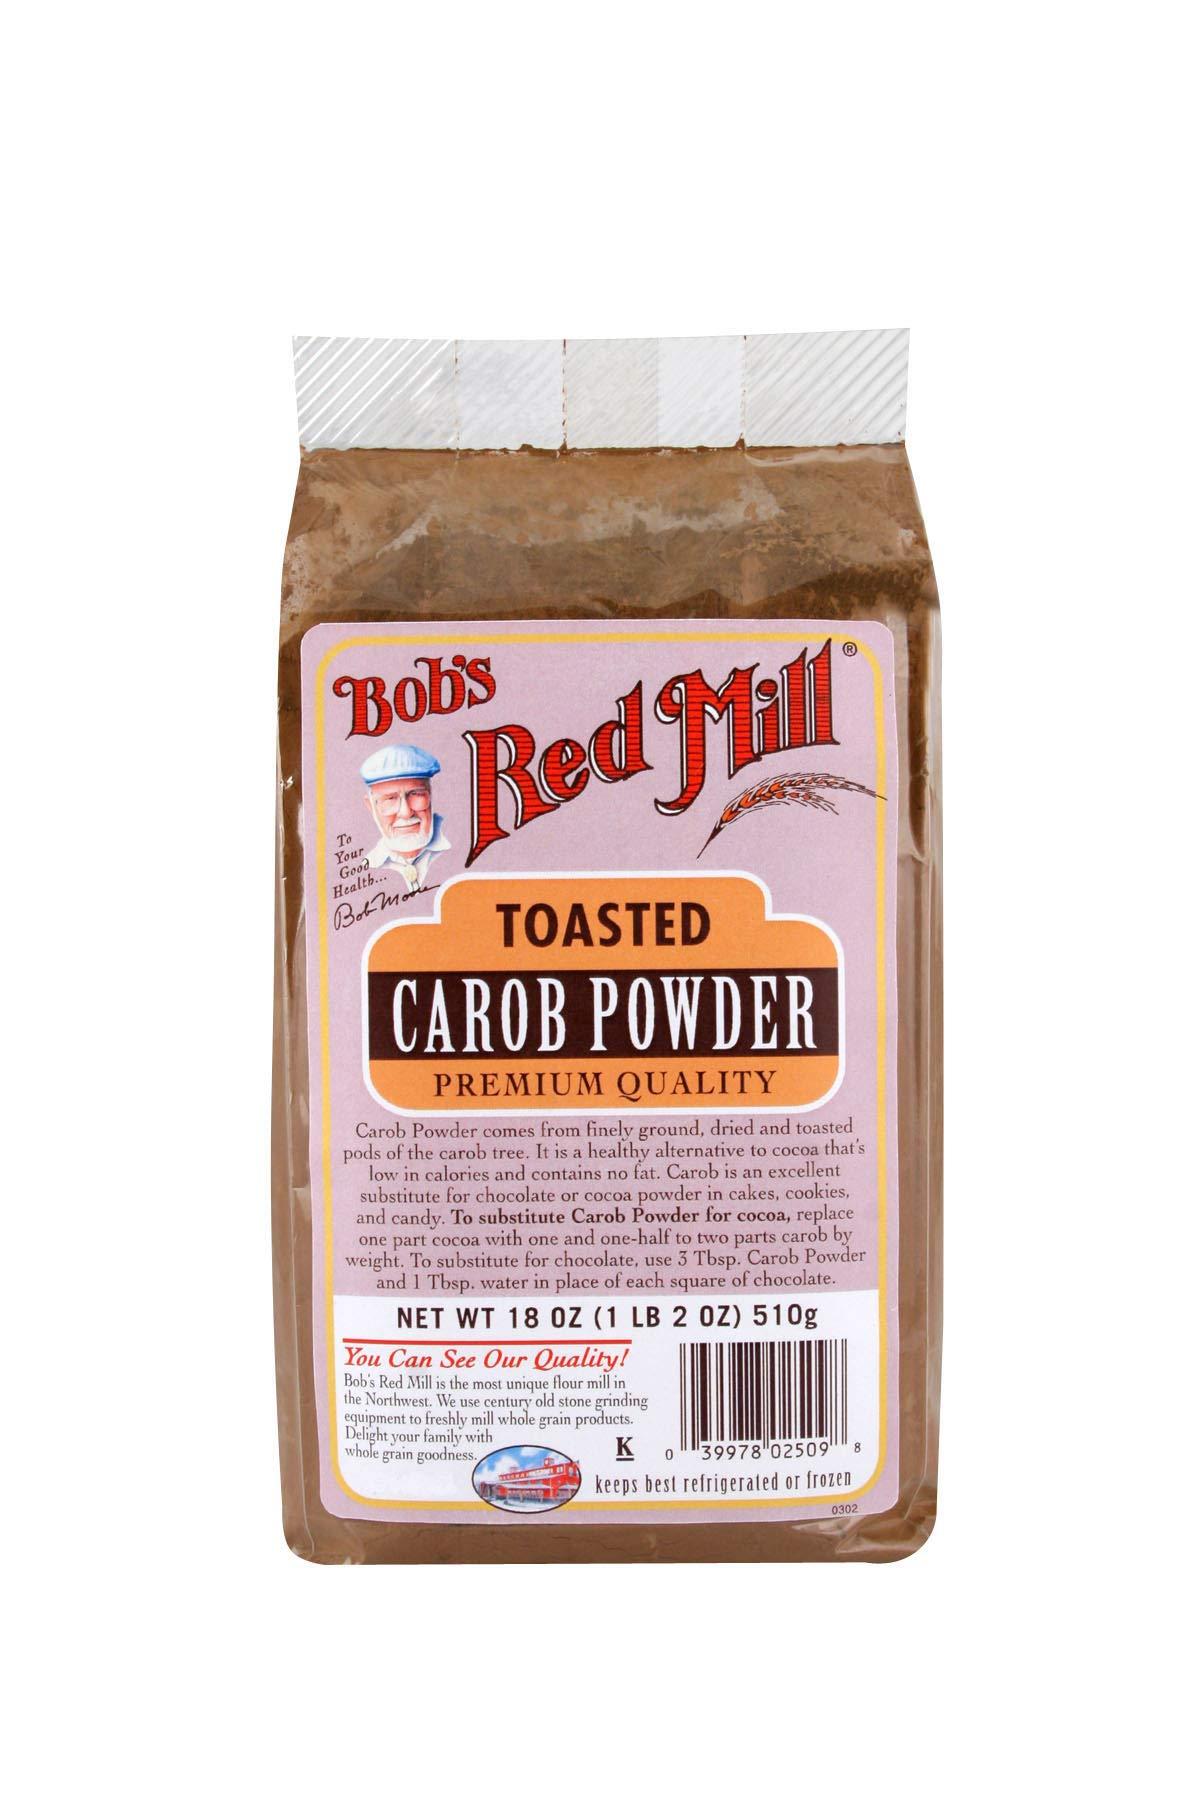 Bob's Red Mill Carob Powder Toasted - 18 oz - 2 pk